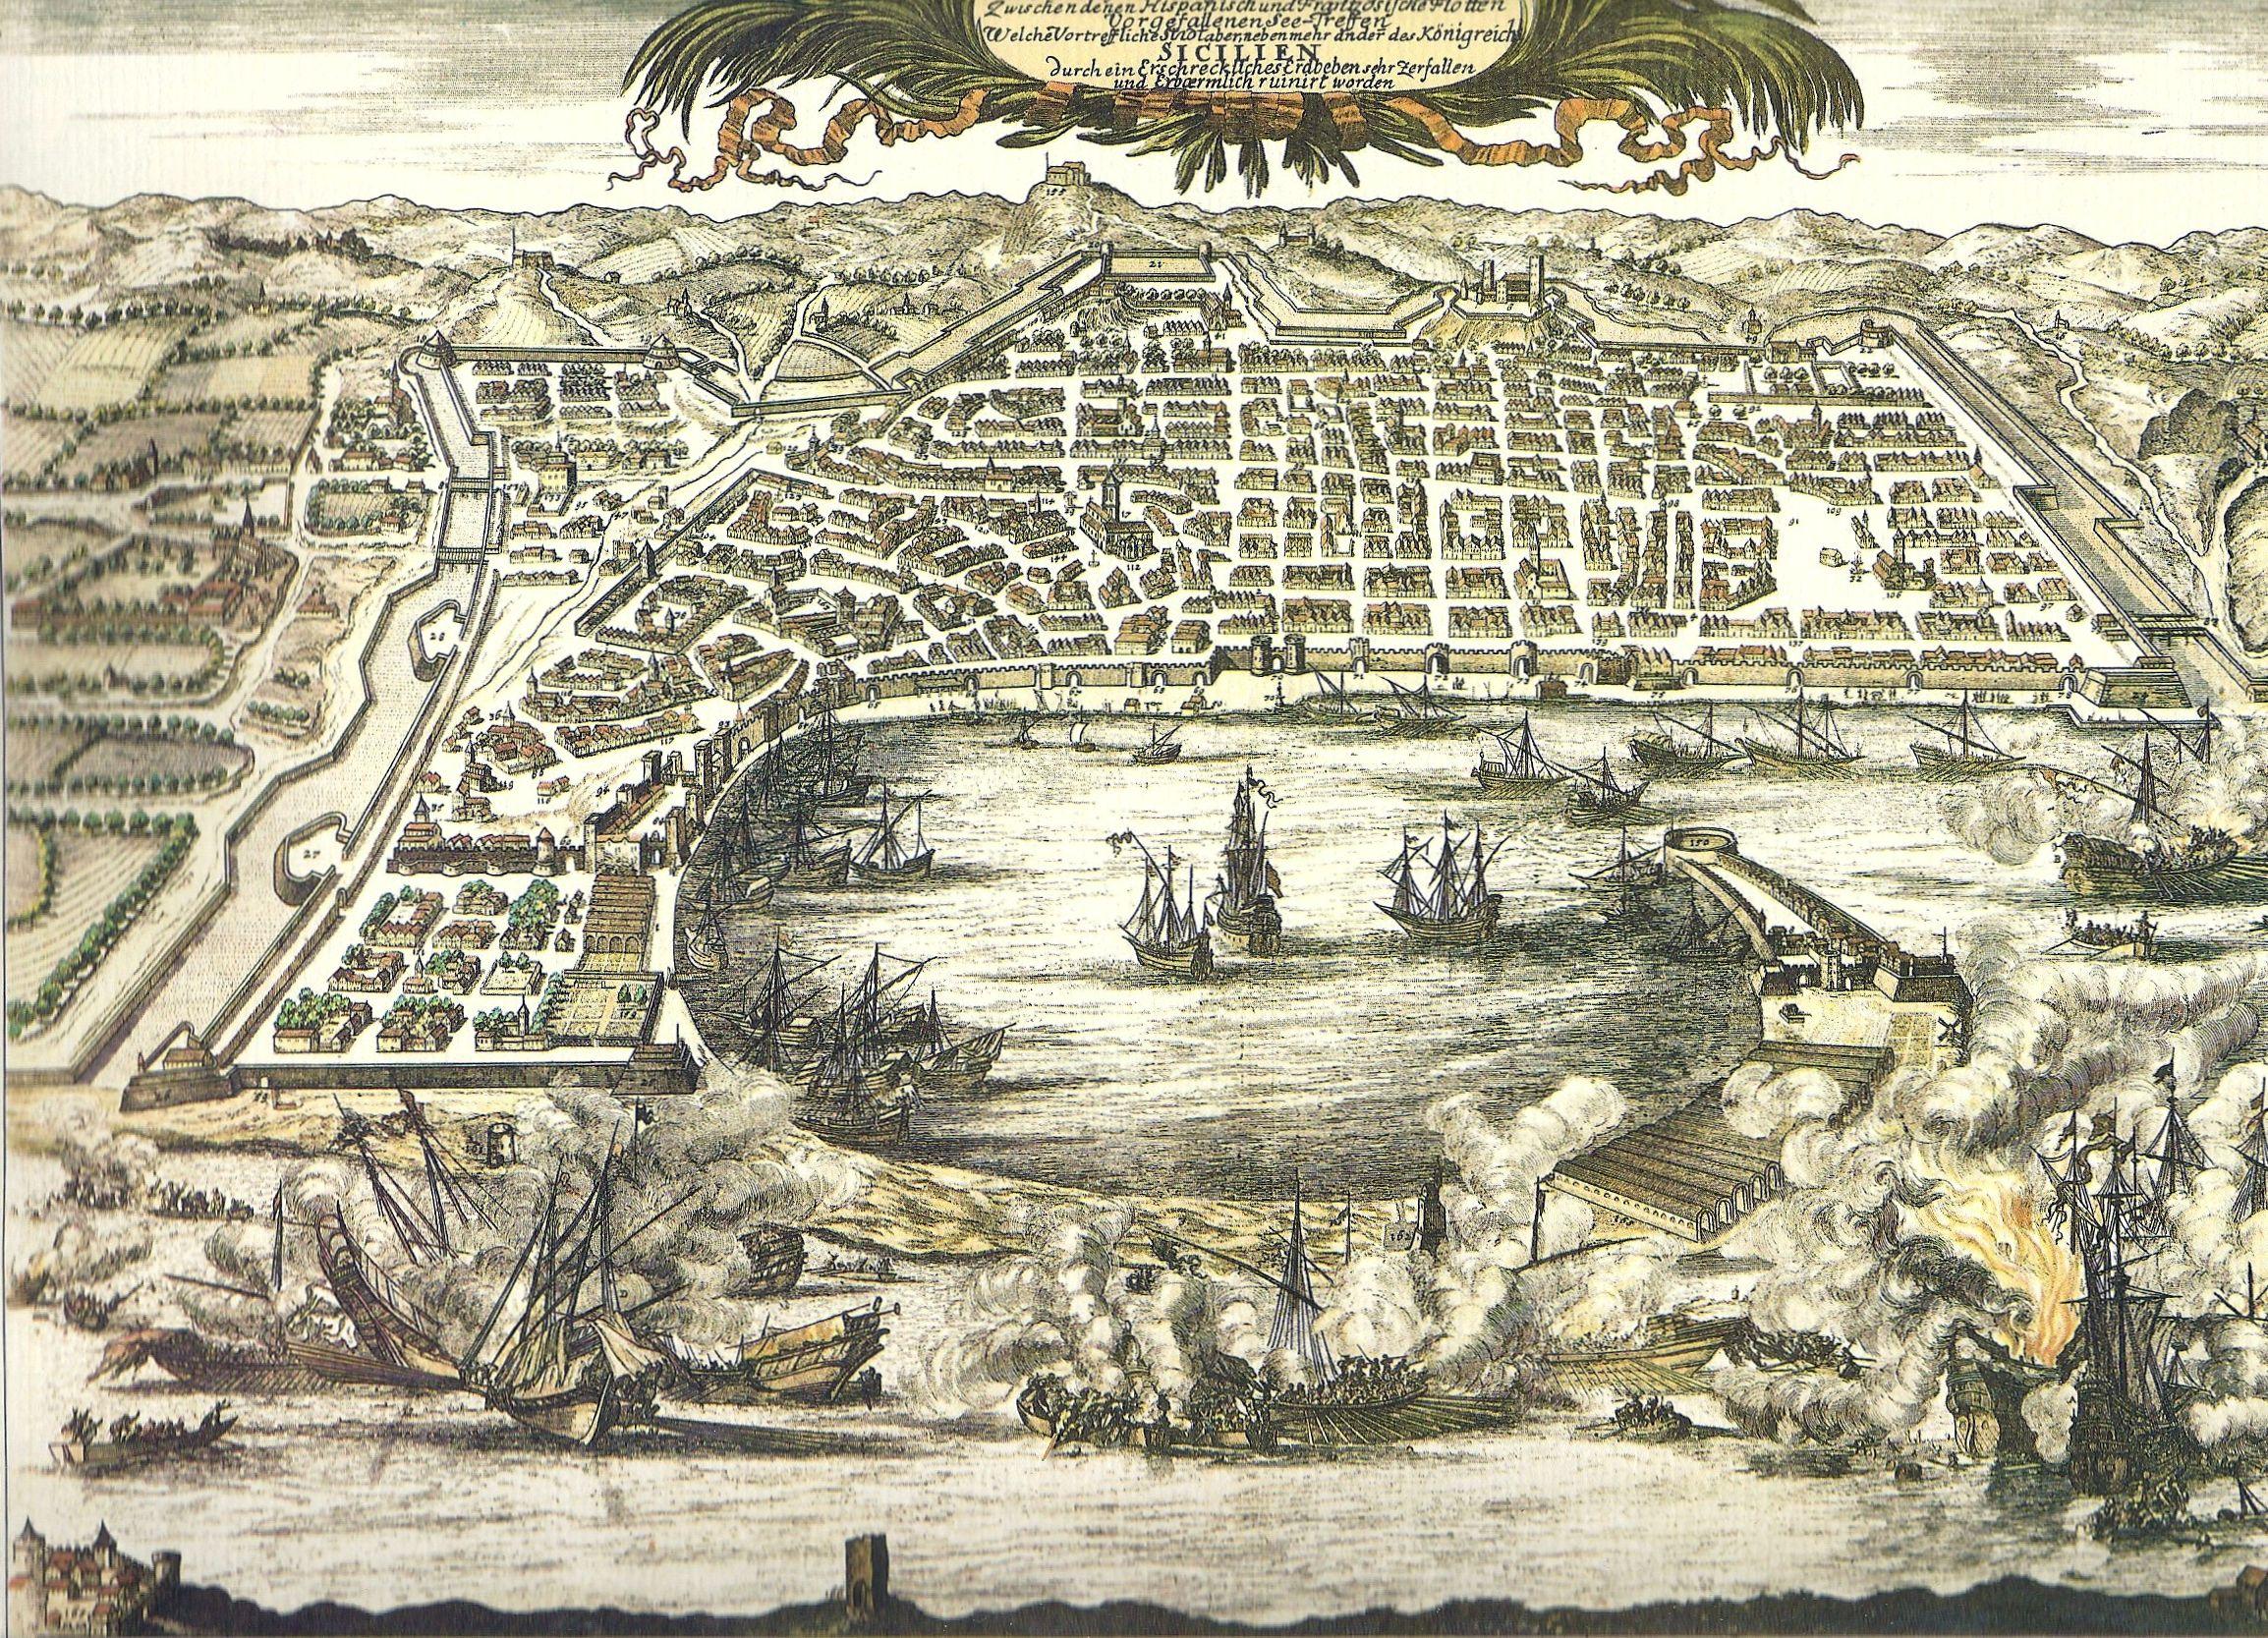 File:Seeschlacht vor Messina 1678.jpg